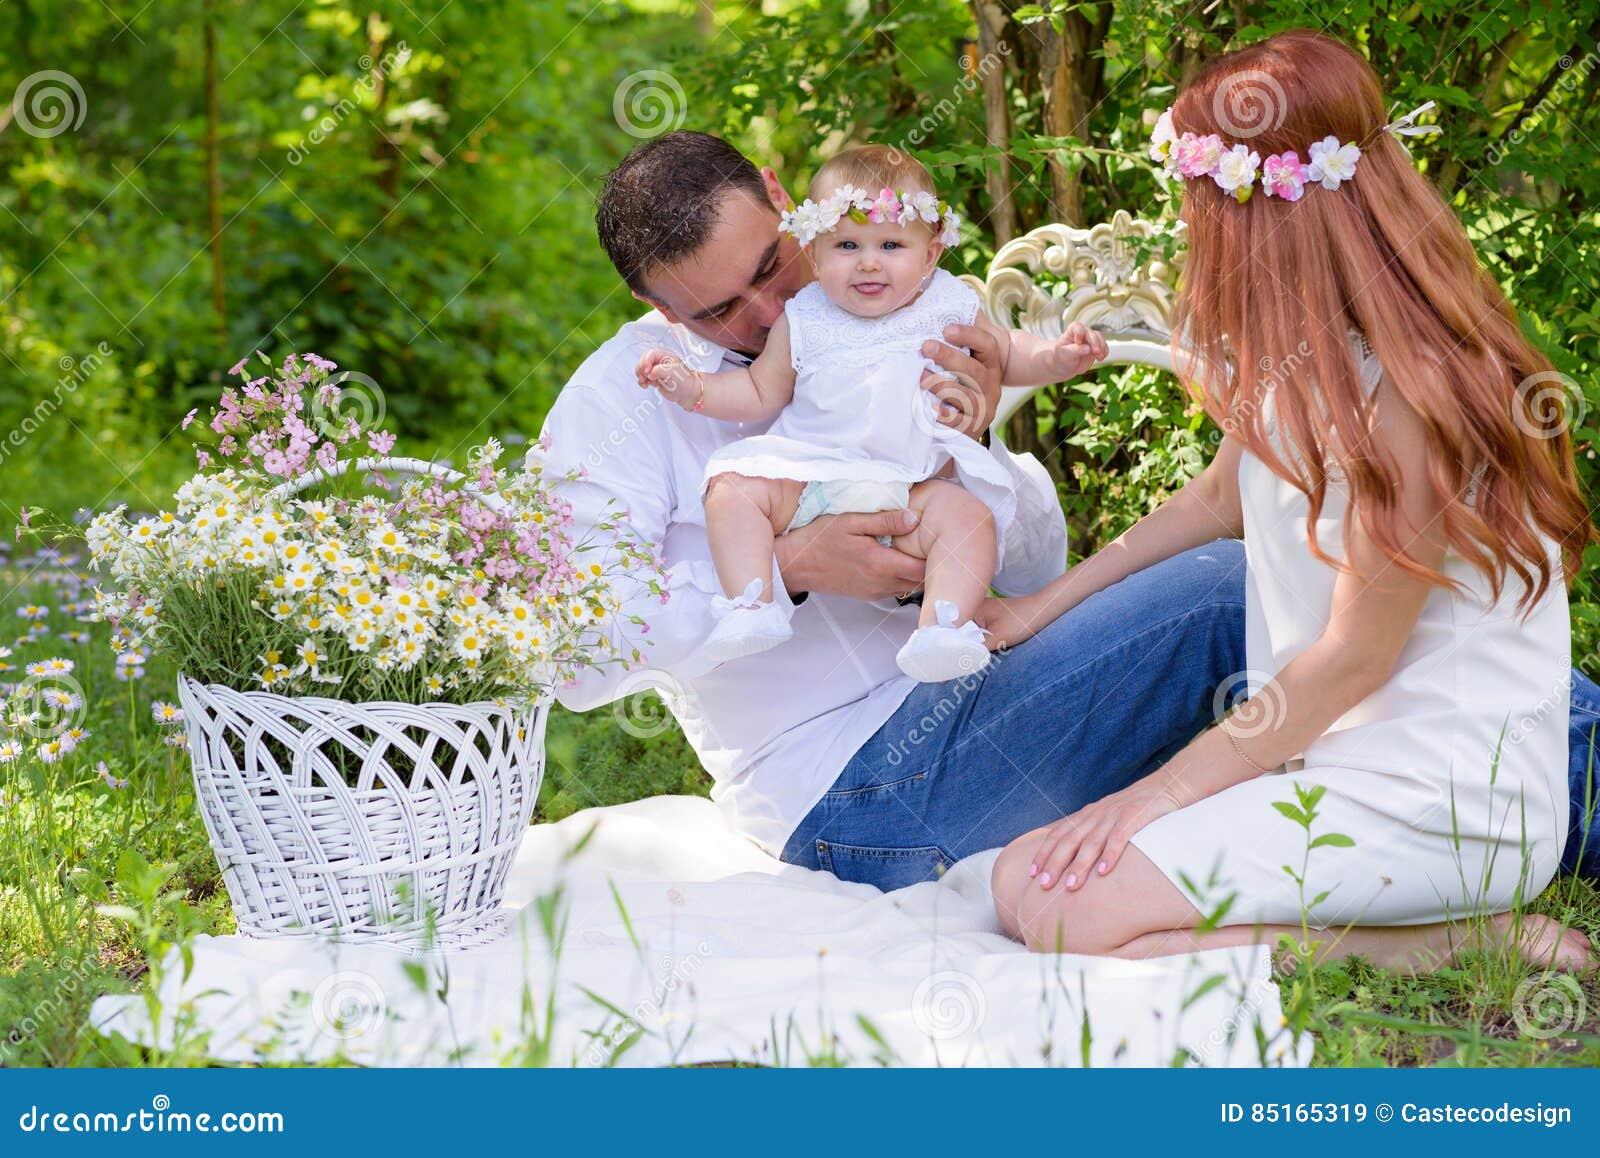 Family portrait outdoors picnic